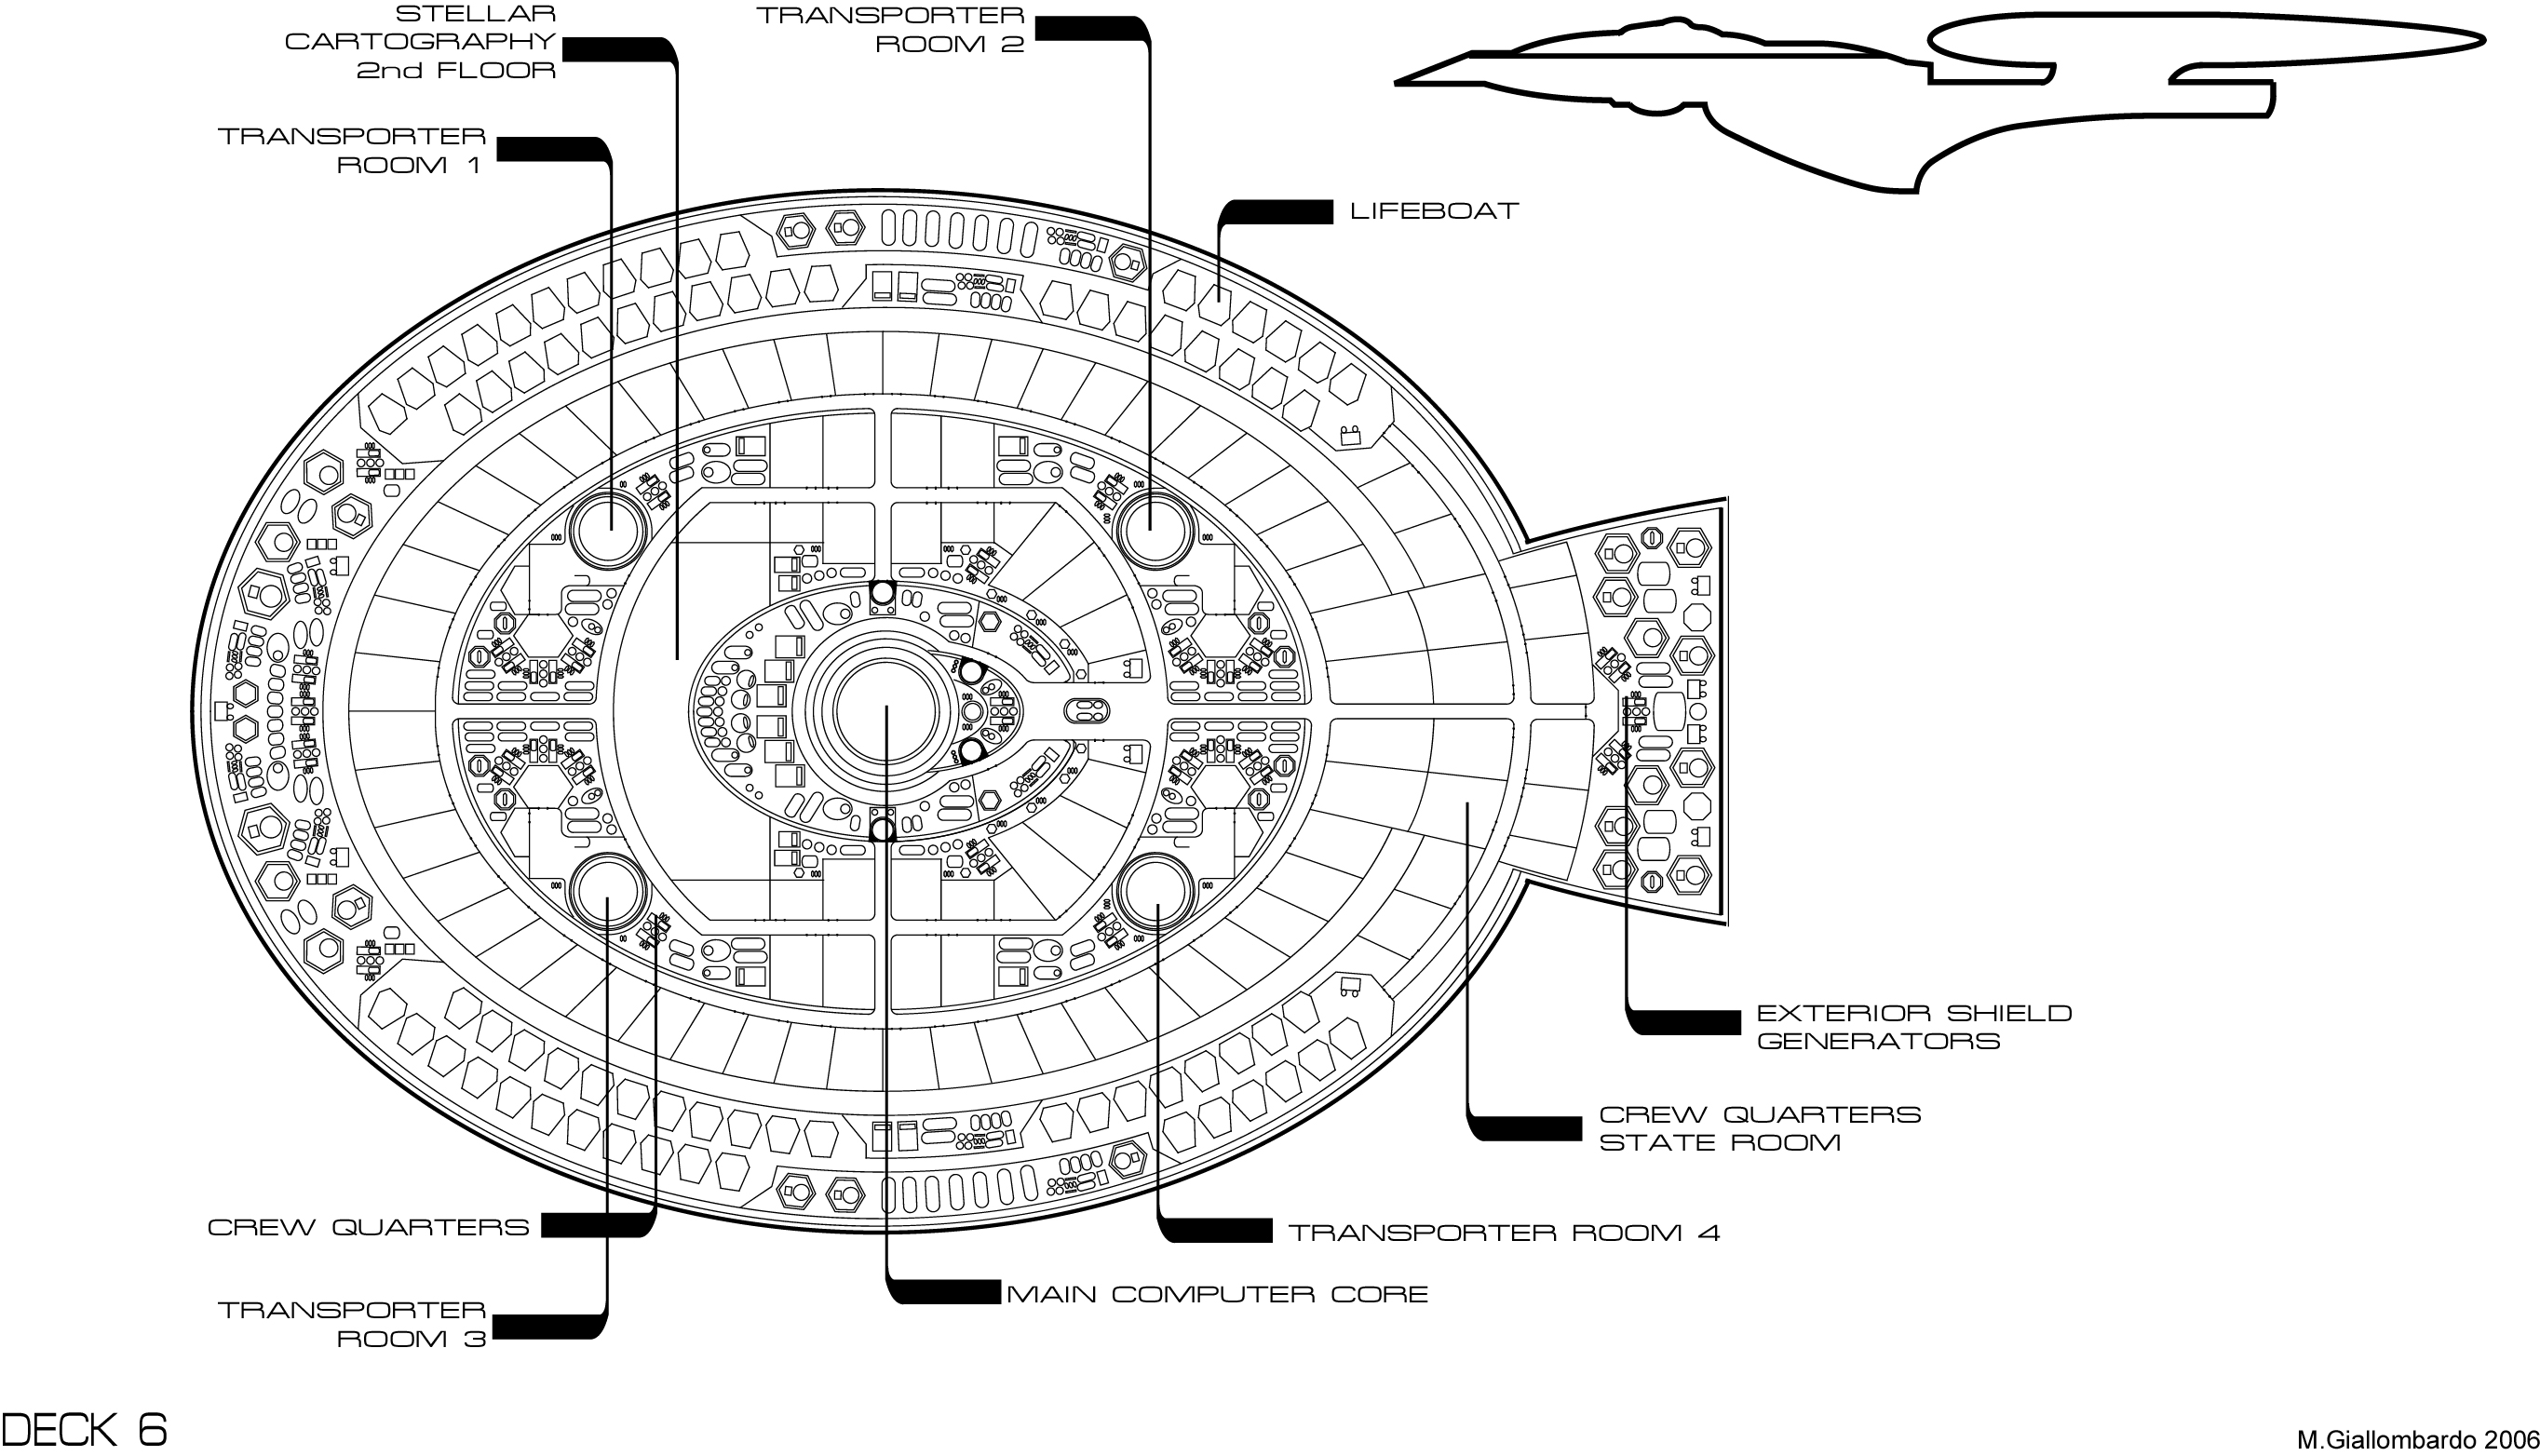 Technical Illustration By Michael Giallombardo At Coroflot